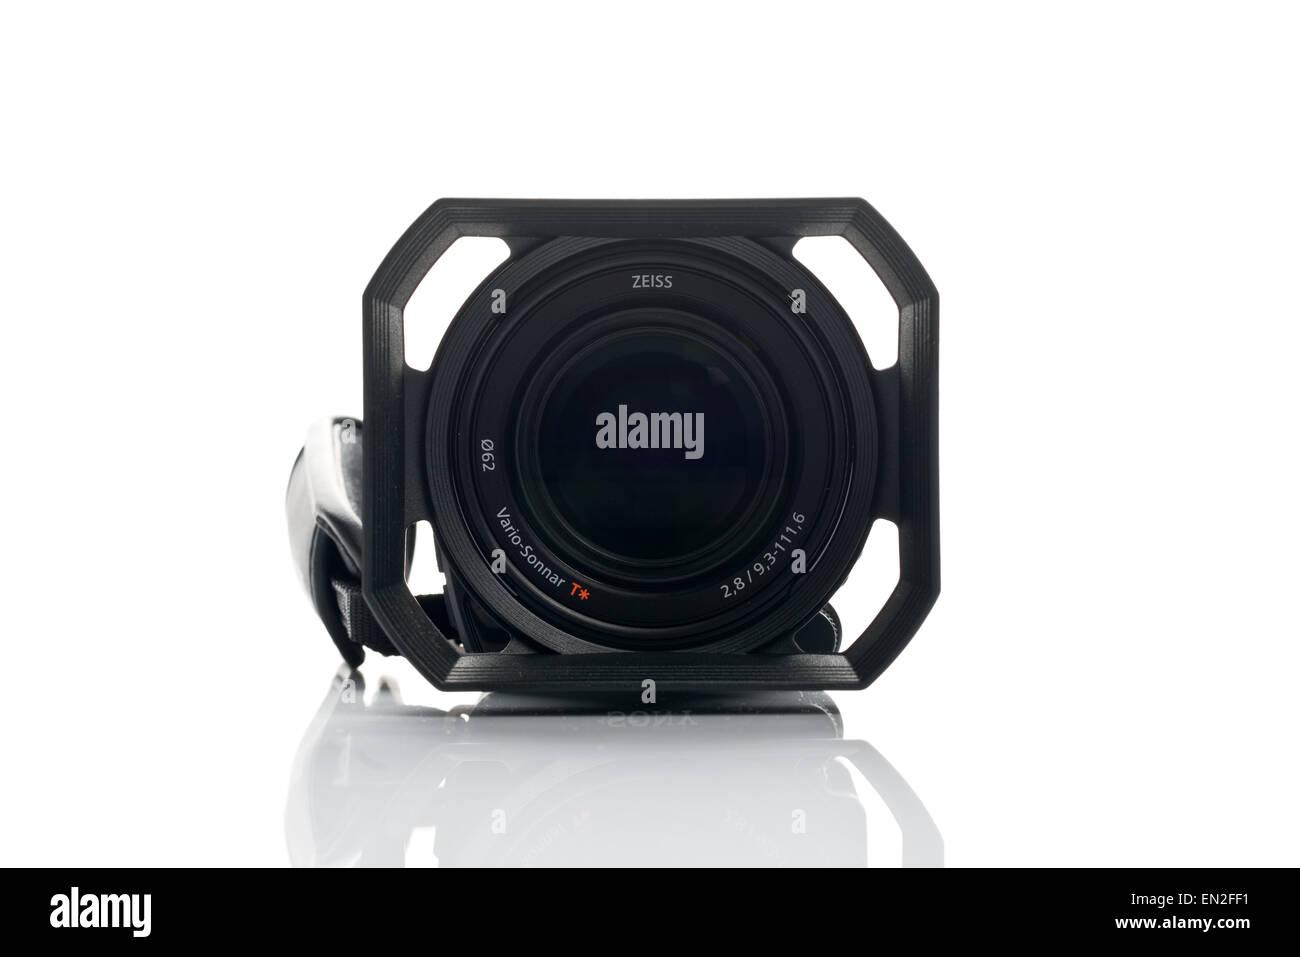 NOVI SAD, SERBIA - APRIL 25, 2015: Sony FDR AX100 4k Handycam Camcorder (announced in 2014.) captures Ultra High - Stock Image